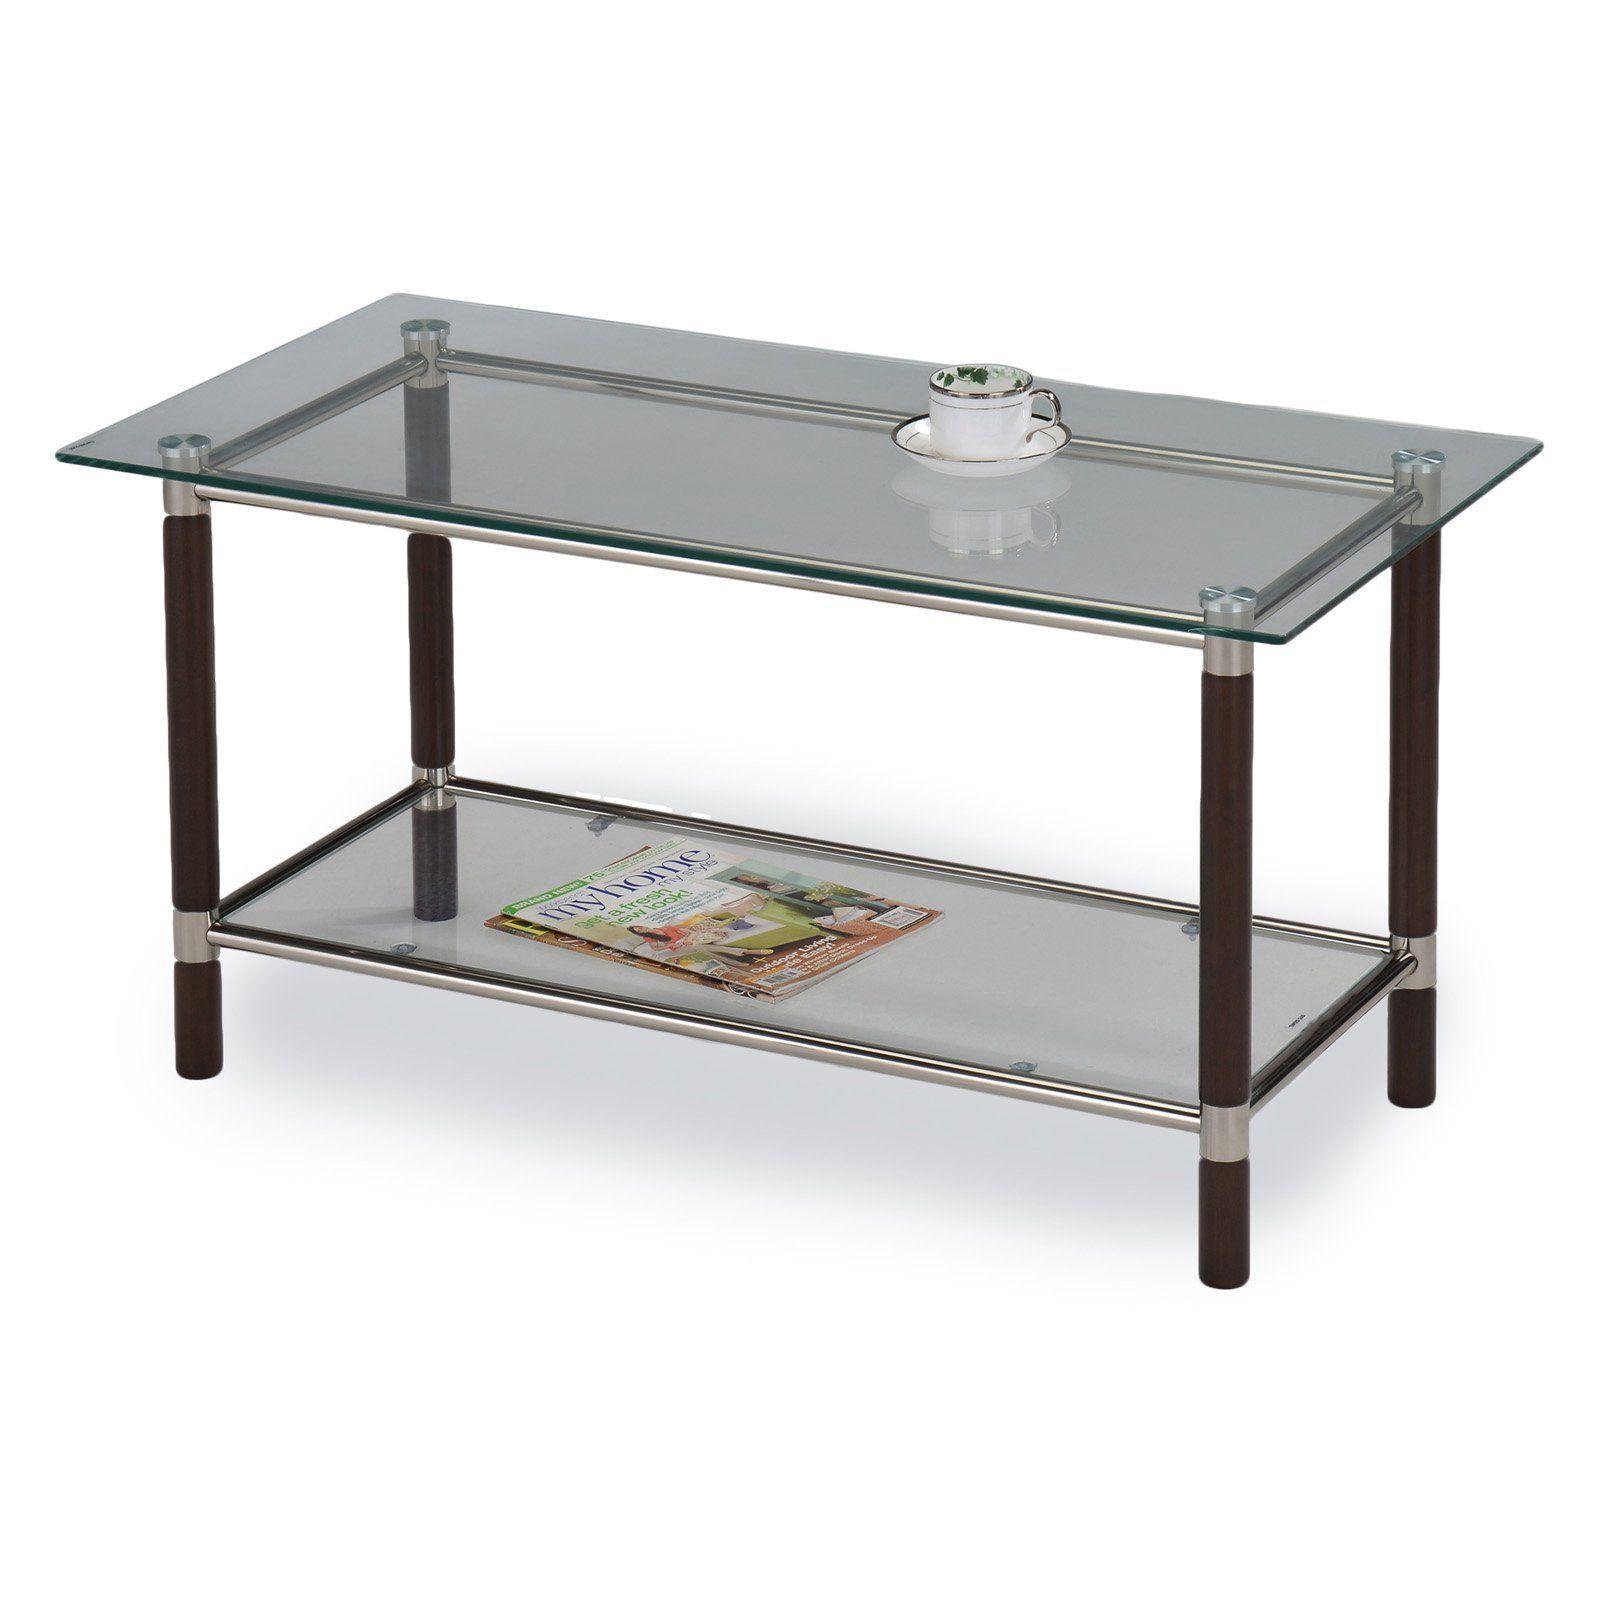 finish leick oak p mission src furniture blef in d cdls com nightstand prod shopladder